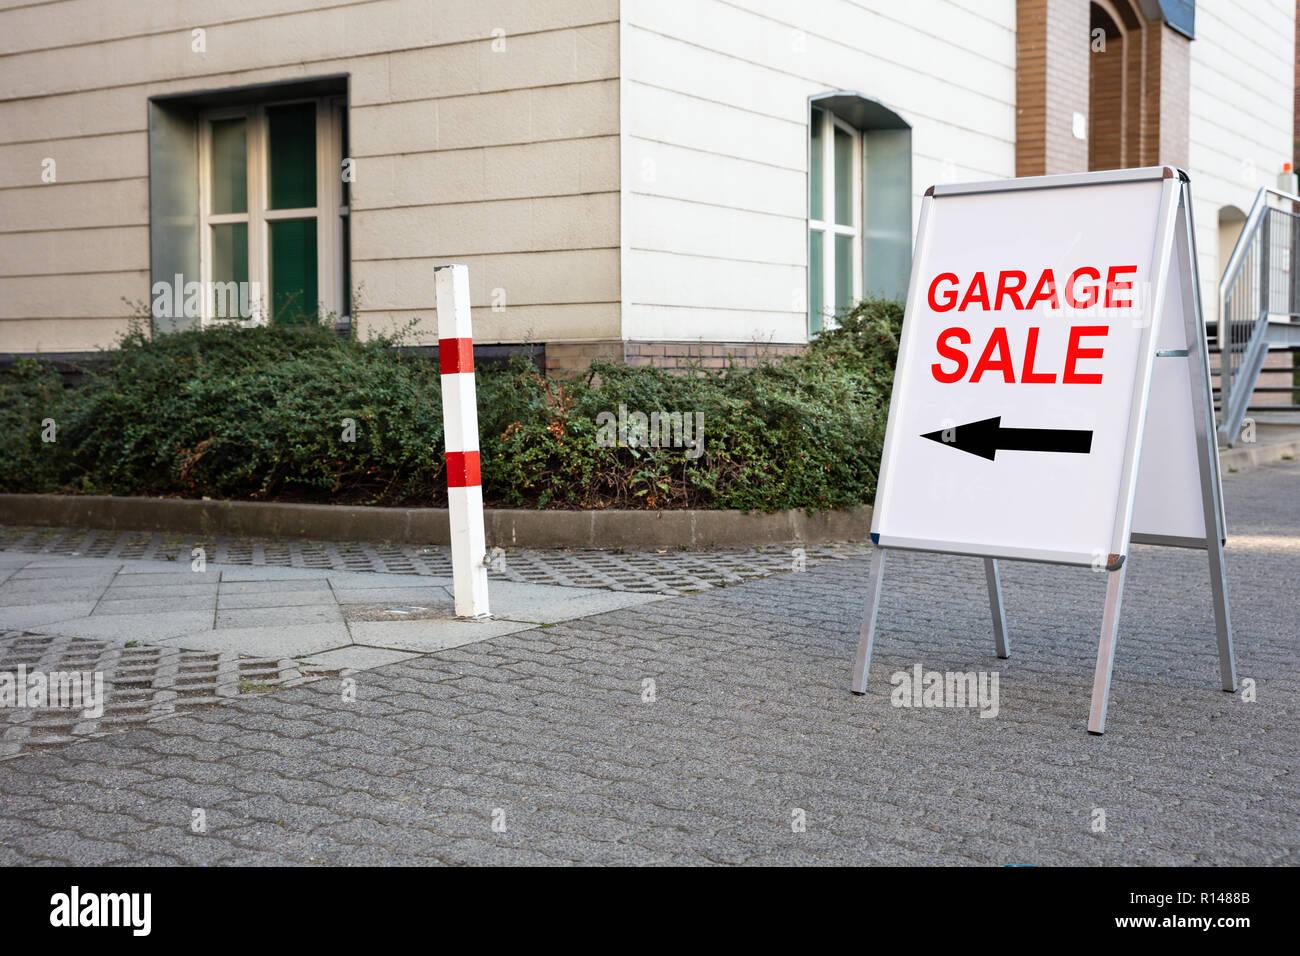 Garage Sale Stock Photos & Garage Sale Stock Images - Alamy